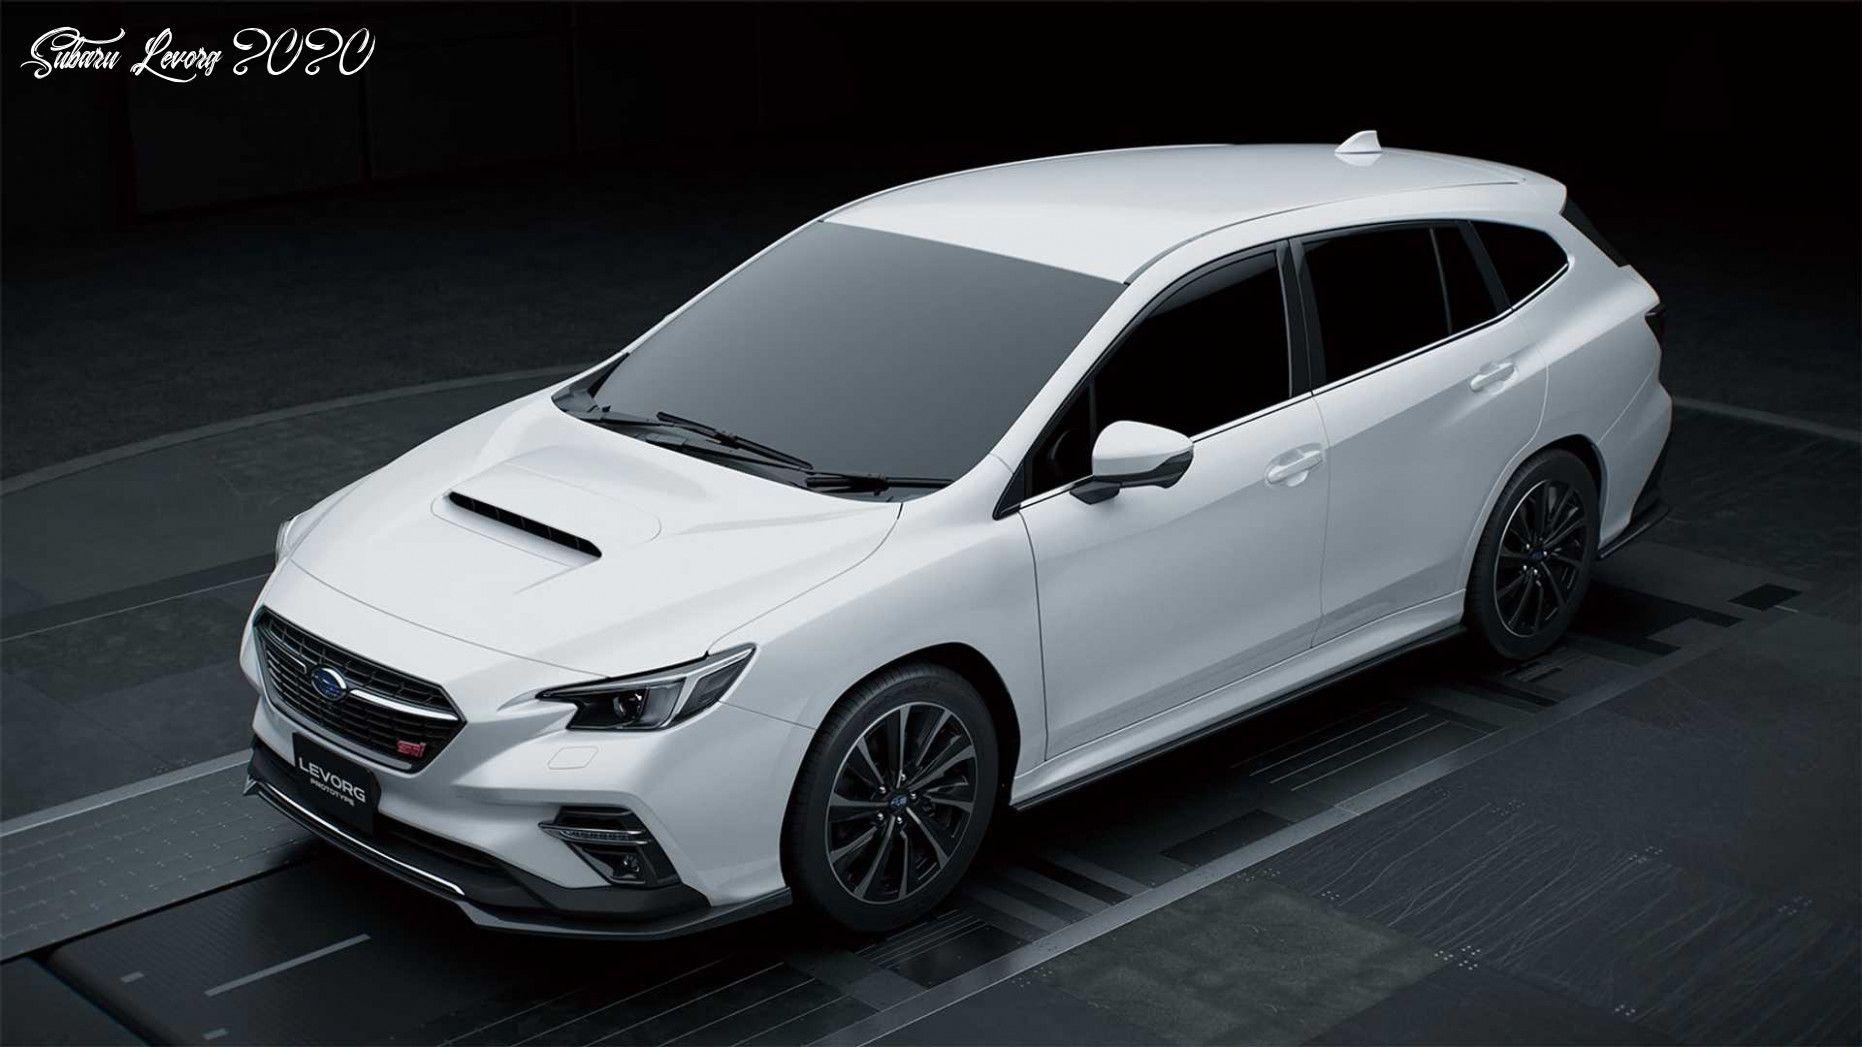 Subaru Levorg 2020 Exterior And Interior In 2020 Subaru Levorg Subaru Wrx Subaru